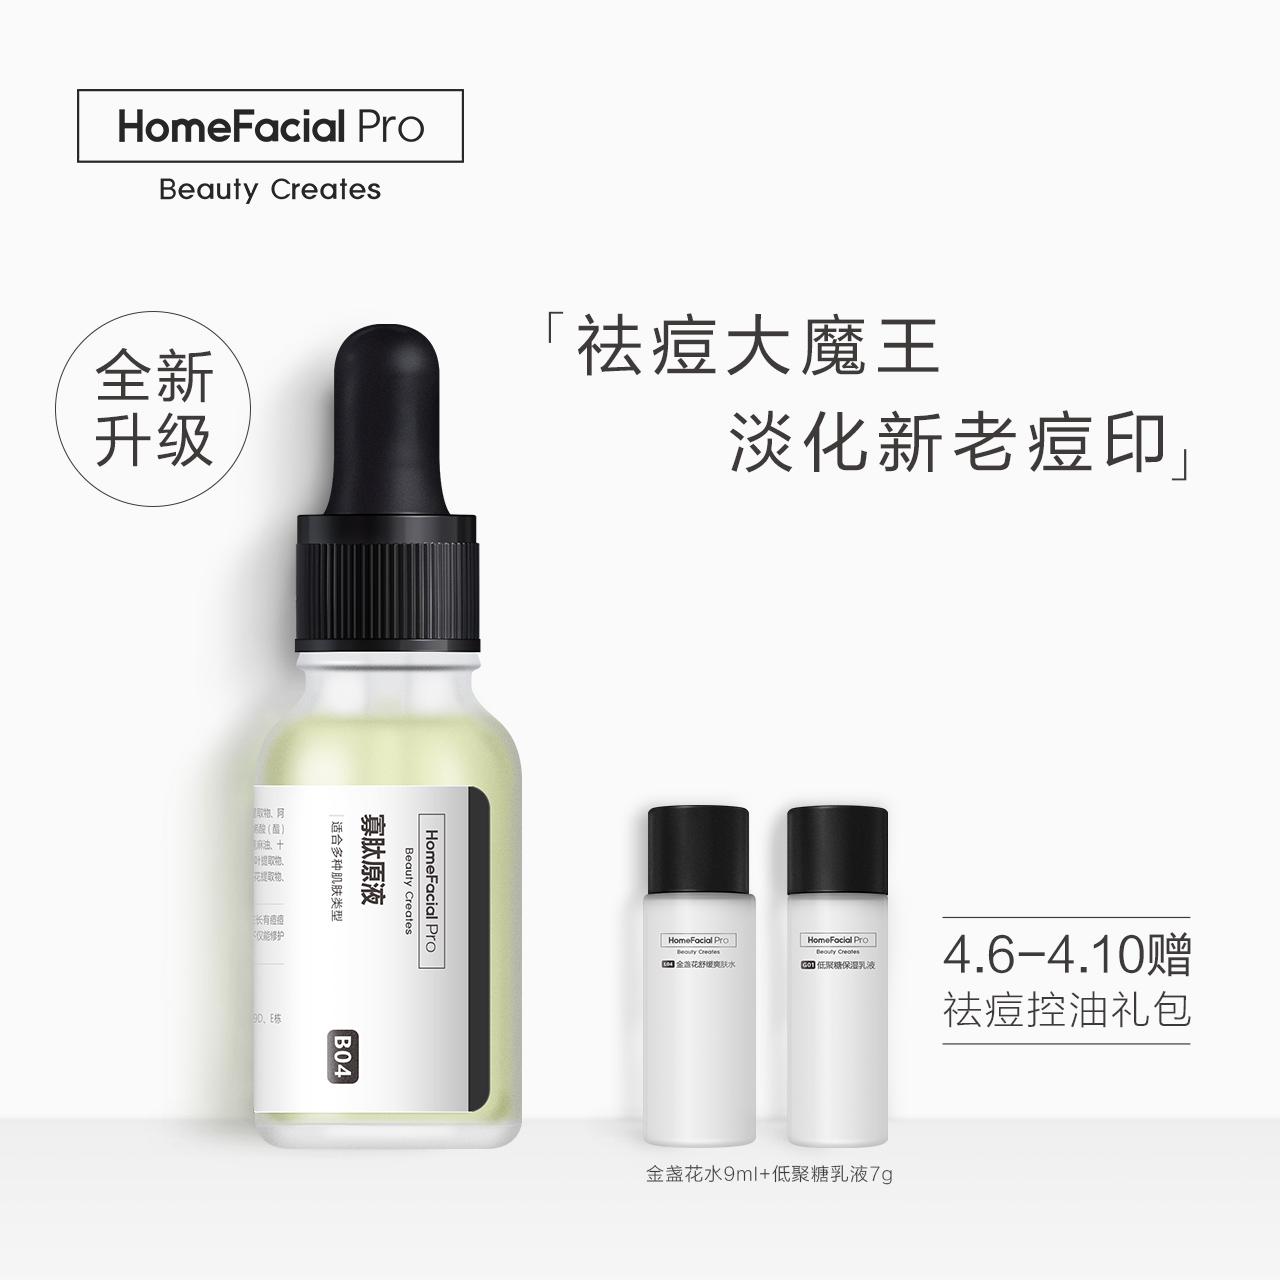 HFP寡肽原液 去淡化痘印痘坑痘疤冻干粉 祛痘产品面部精华液男女图片